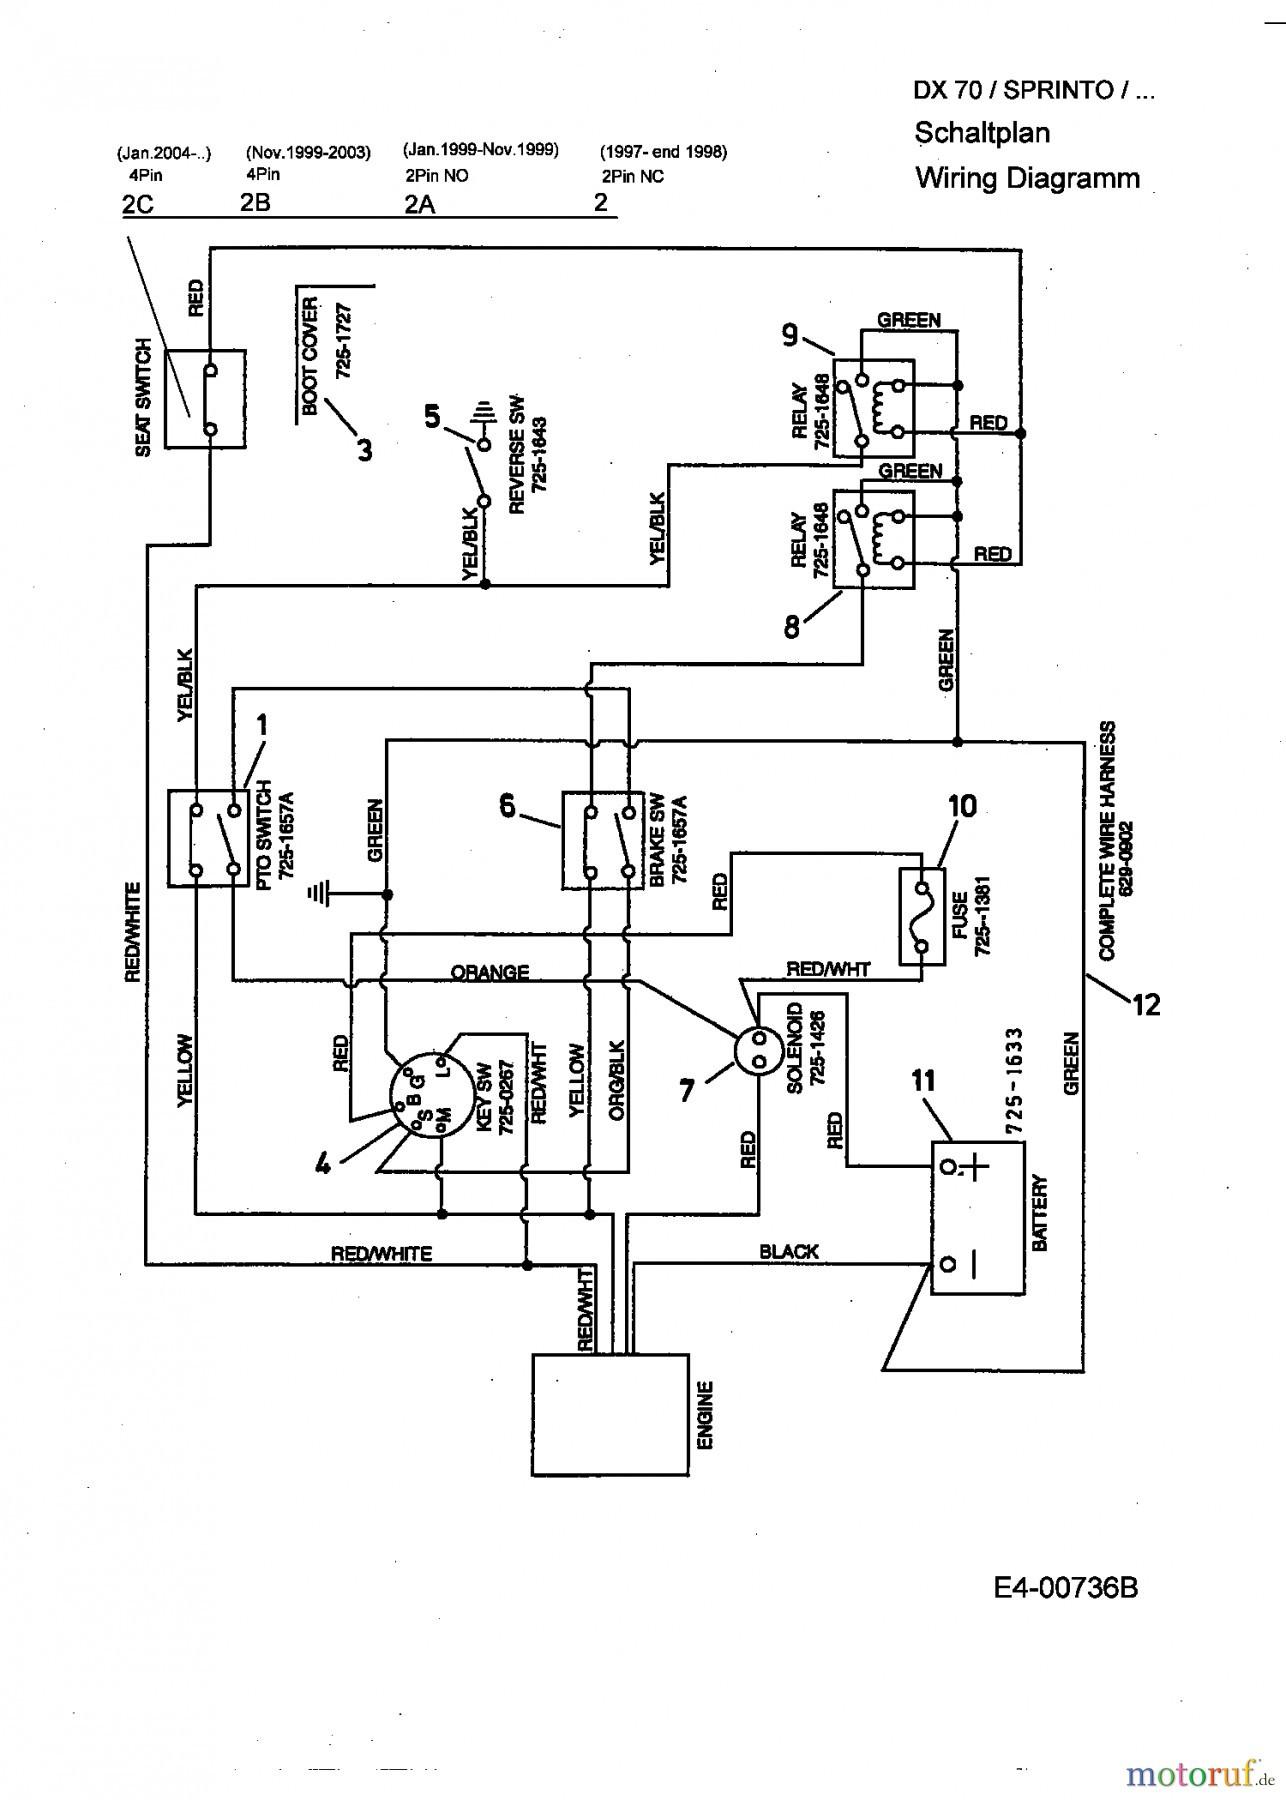 hight resolution of mtd 13cd609g063 wiring diagram wiring diagrams data mtd ignition switch wiring diagram source mtd lawn mower